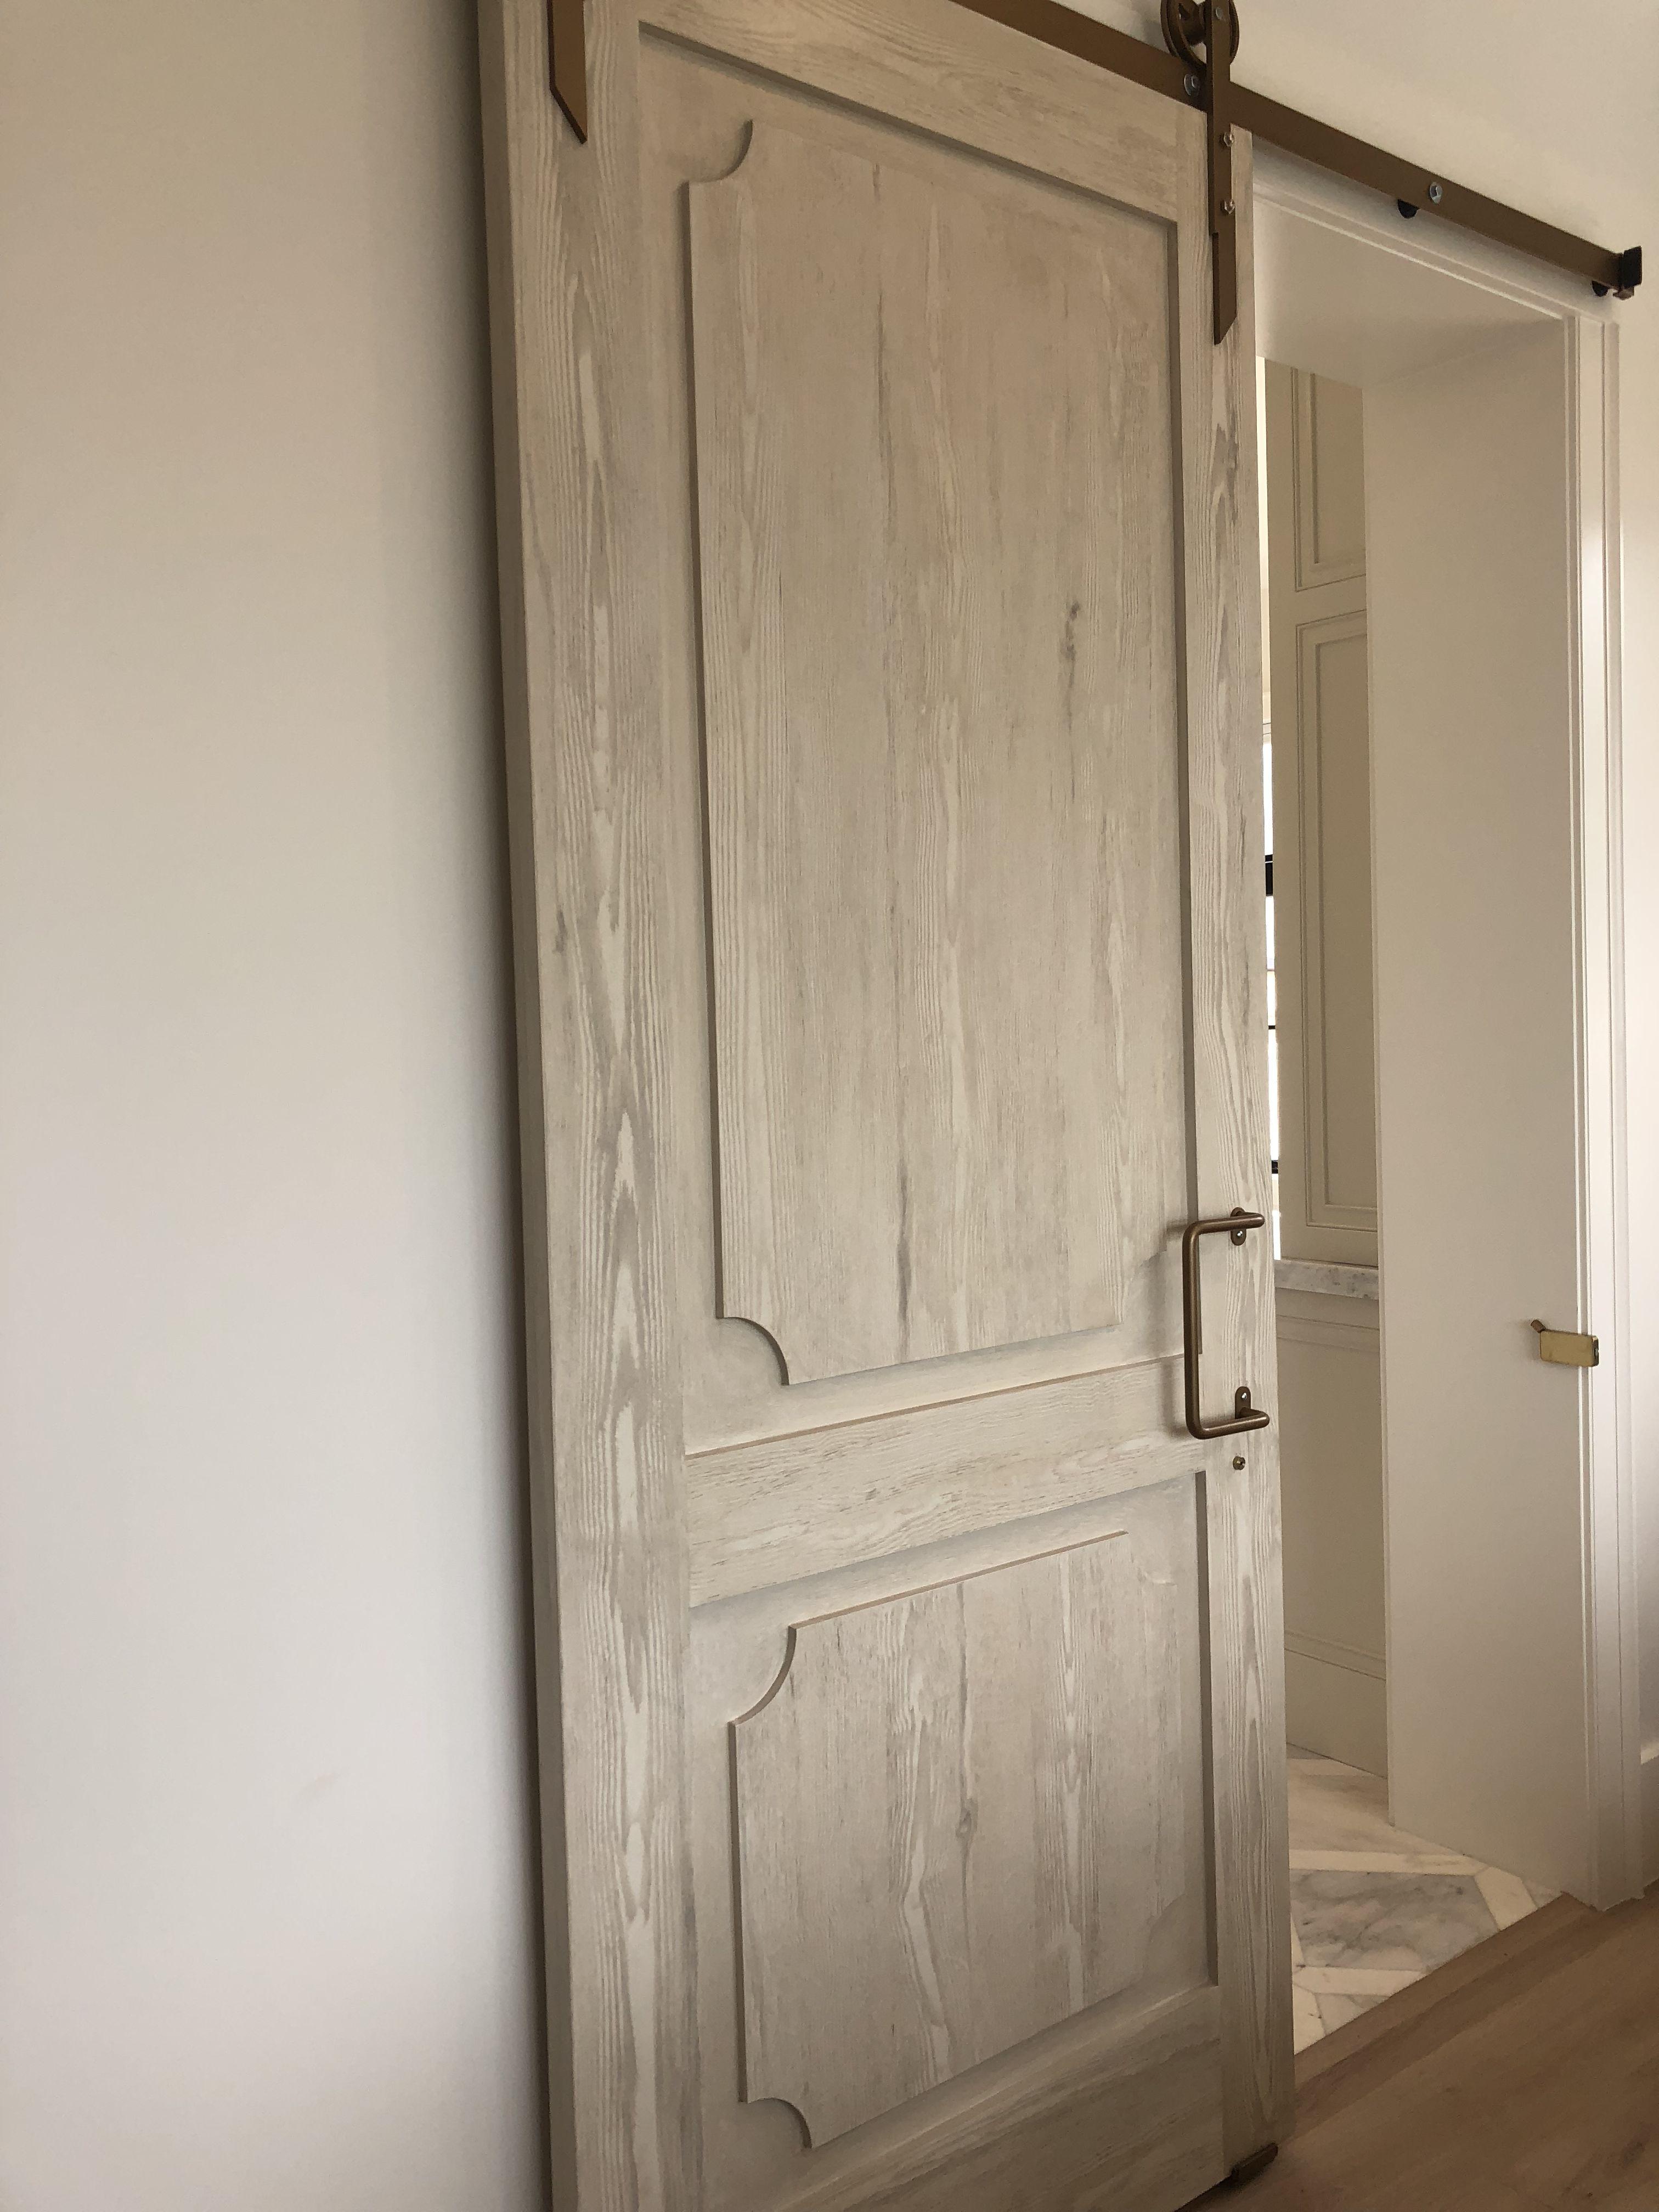 Barn door for master bedroom Tall storage, Barn